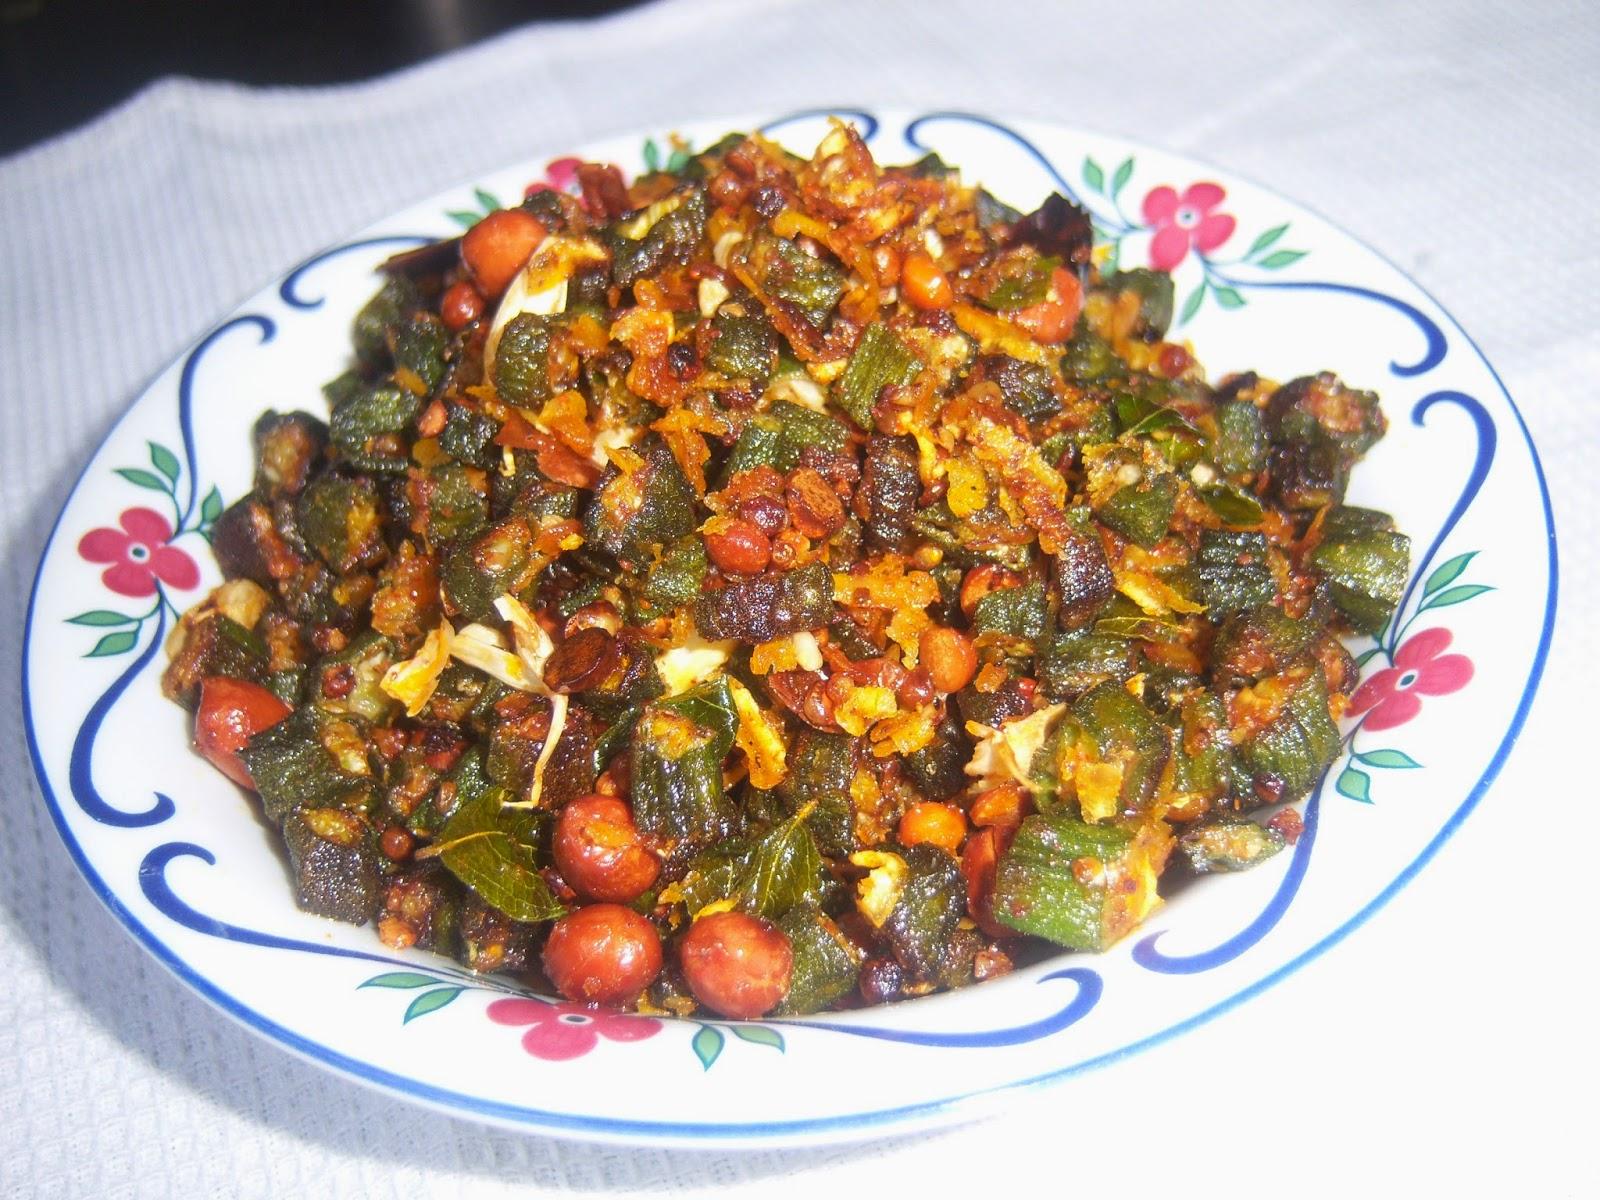 Bhindi Stir Fry